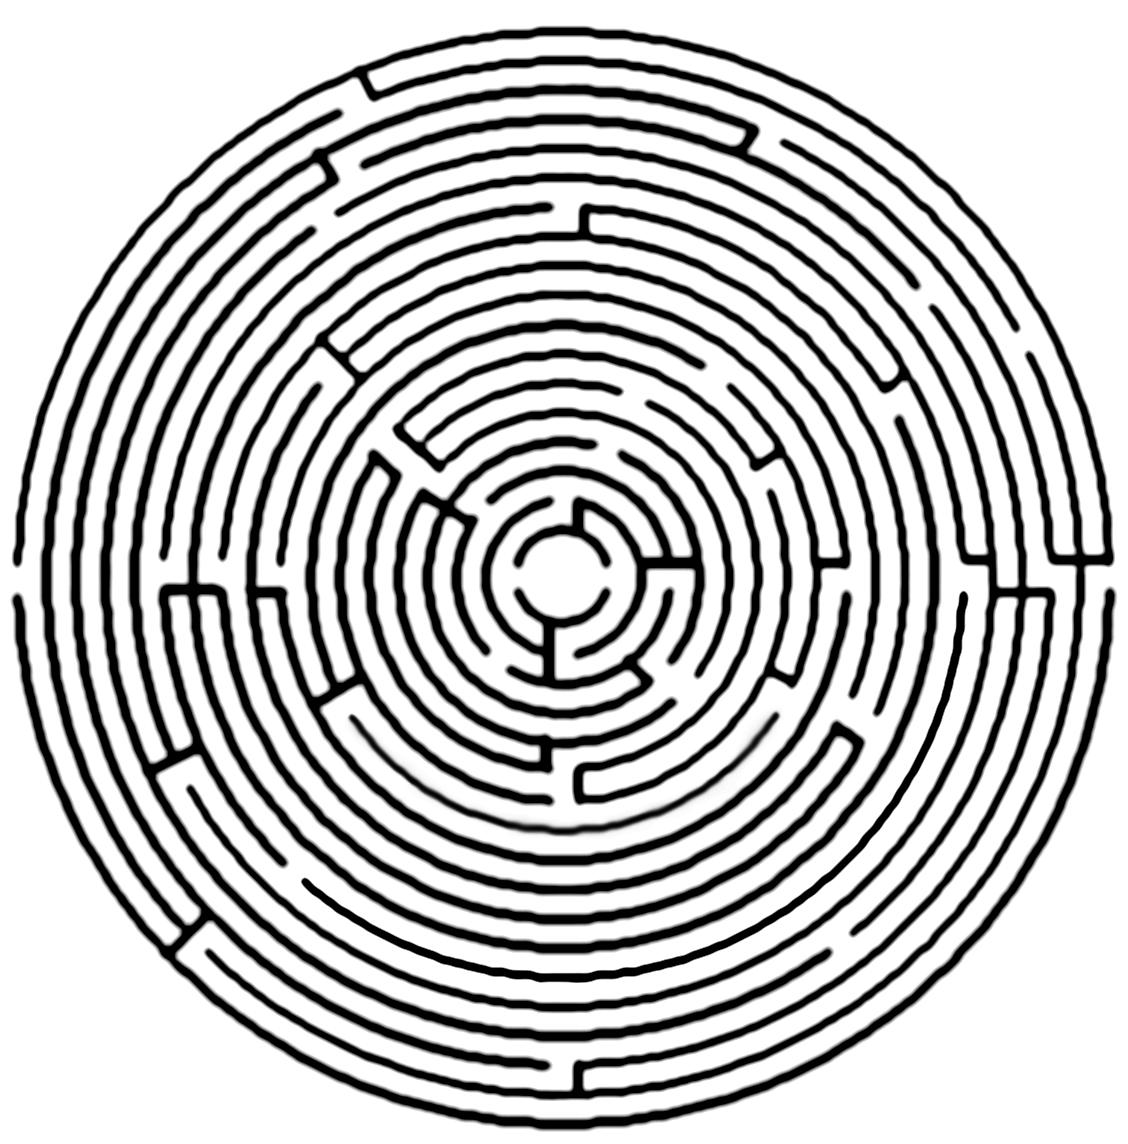 Elgar S Enigma Theme Unmasked Elgar S Enigma Theme Pi And C